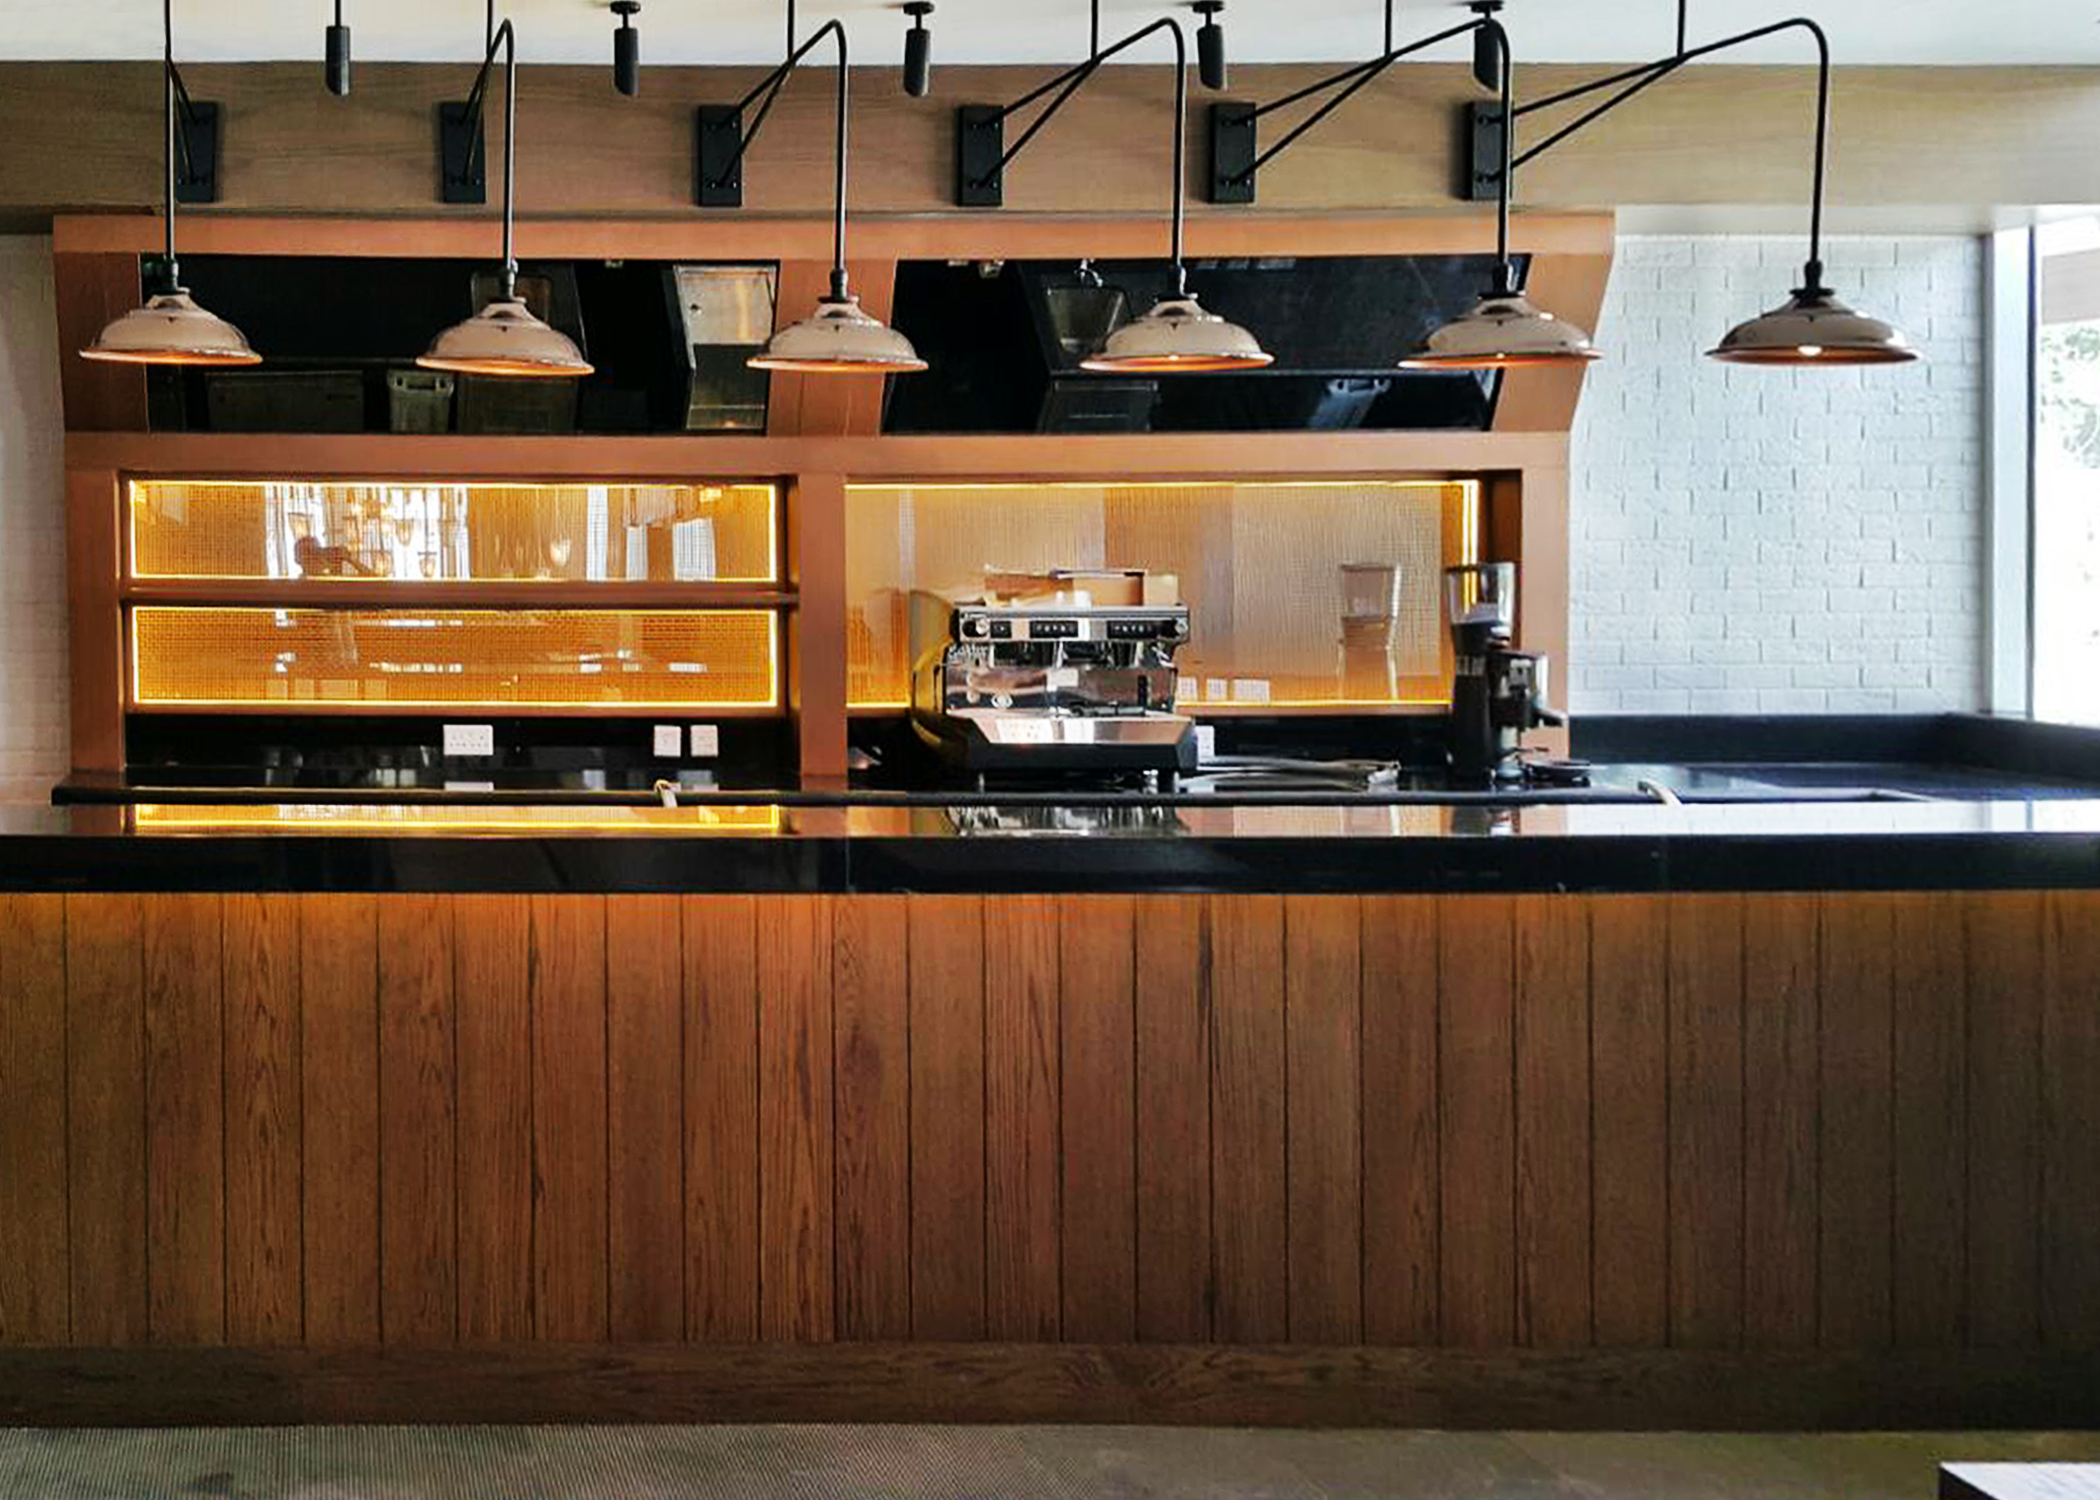 Fish Pub (4)